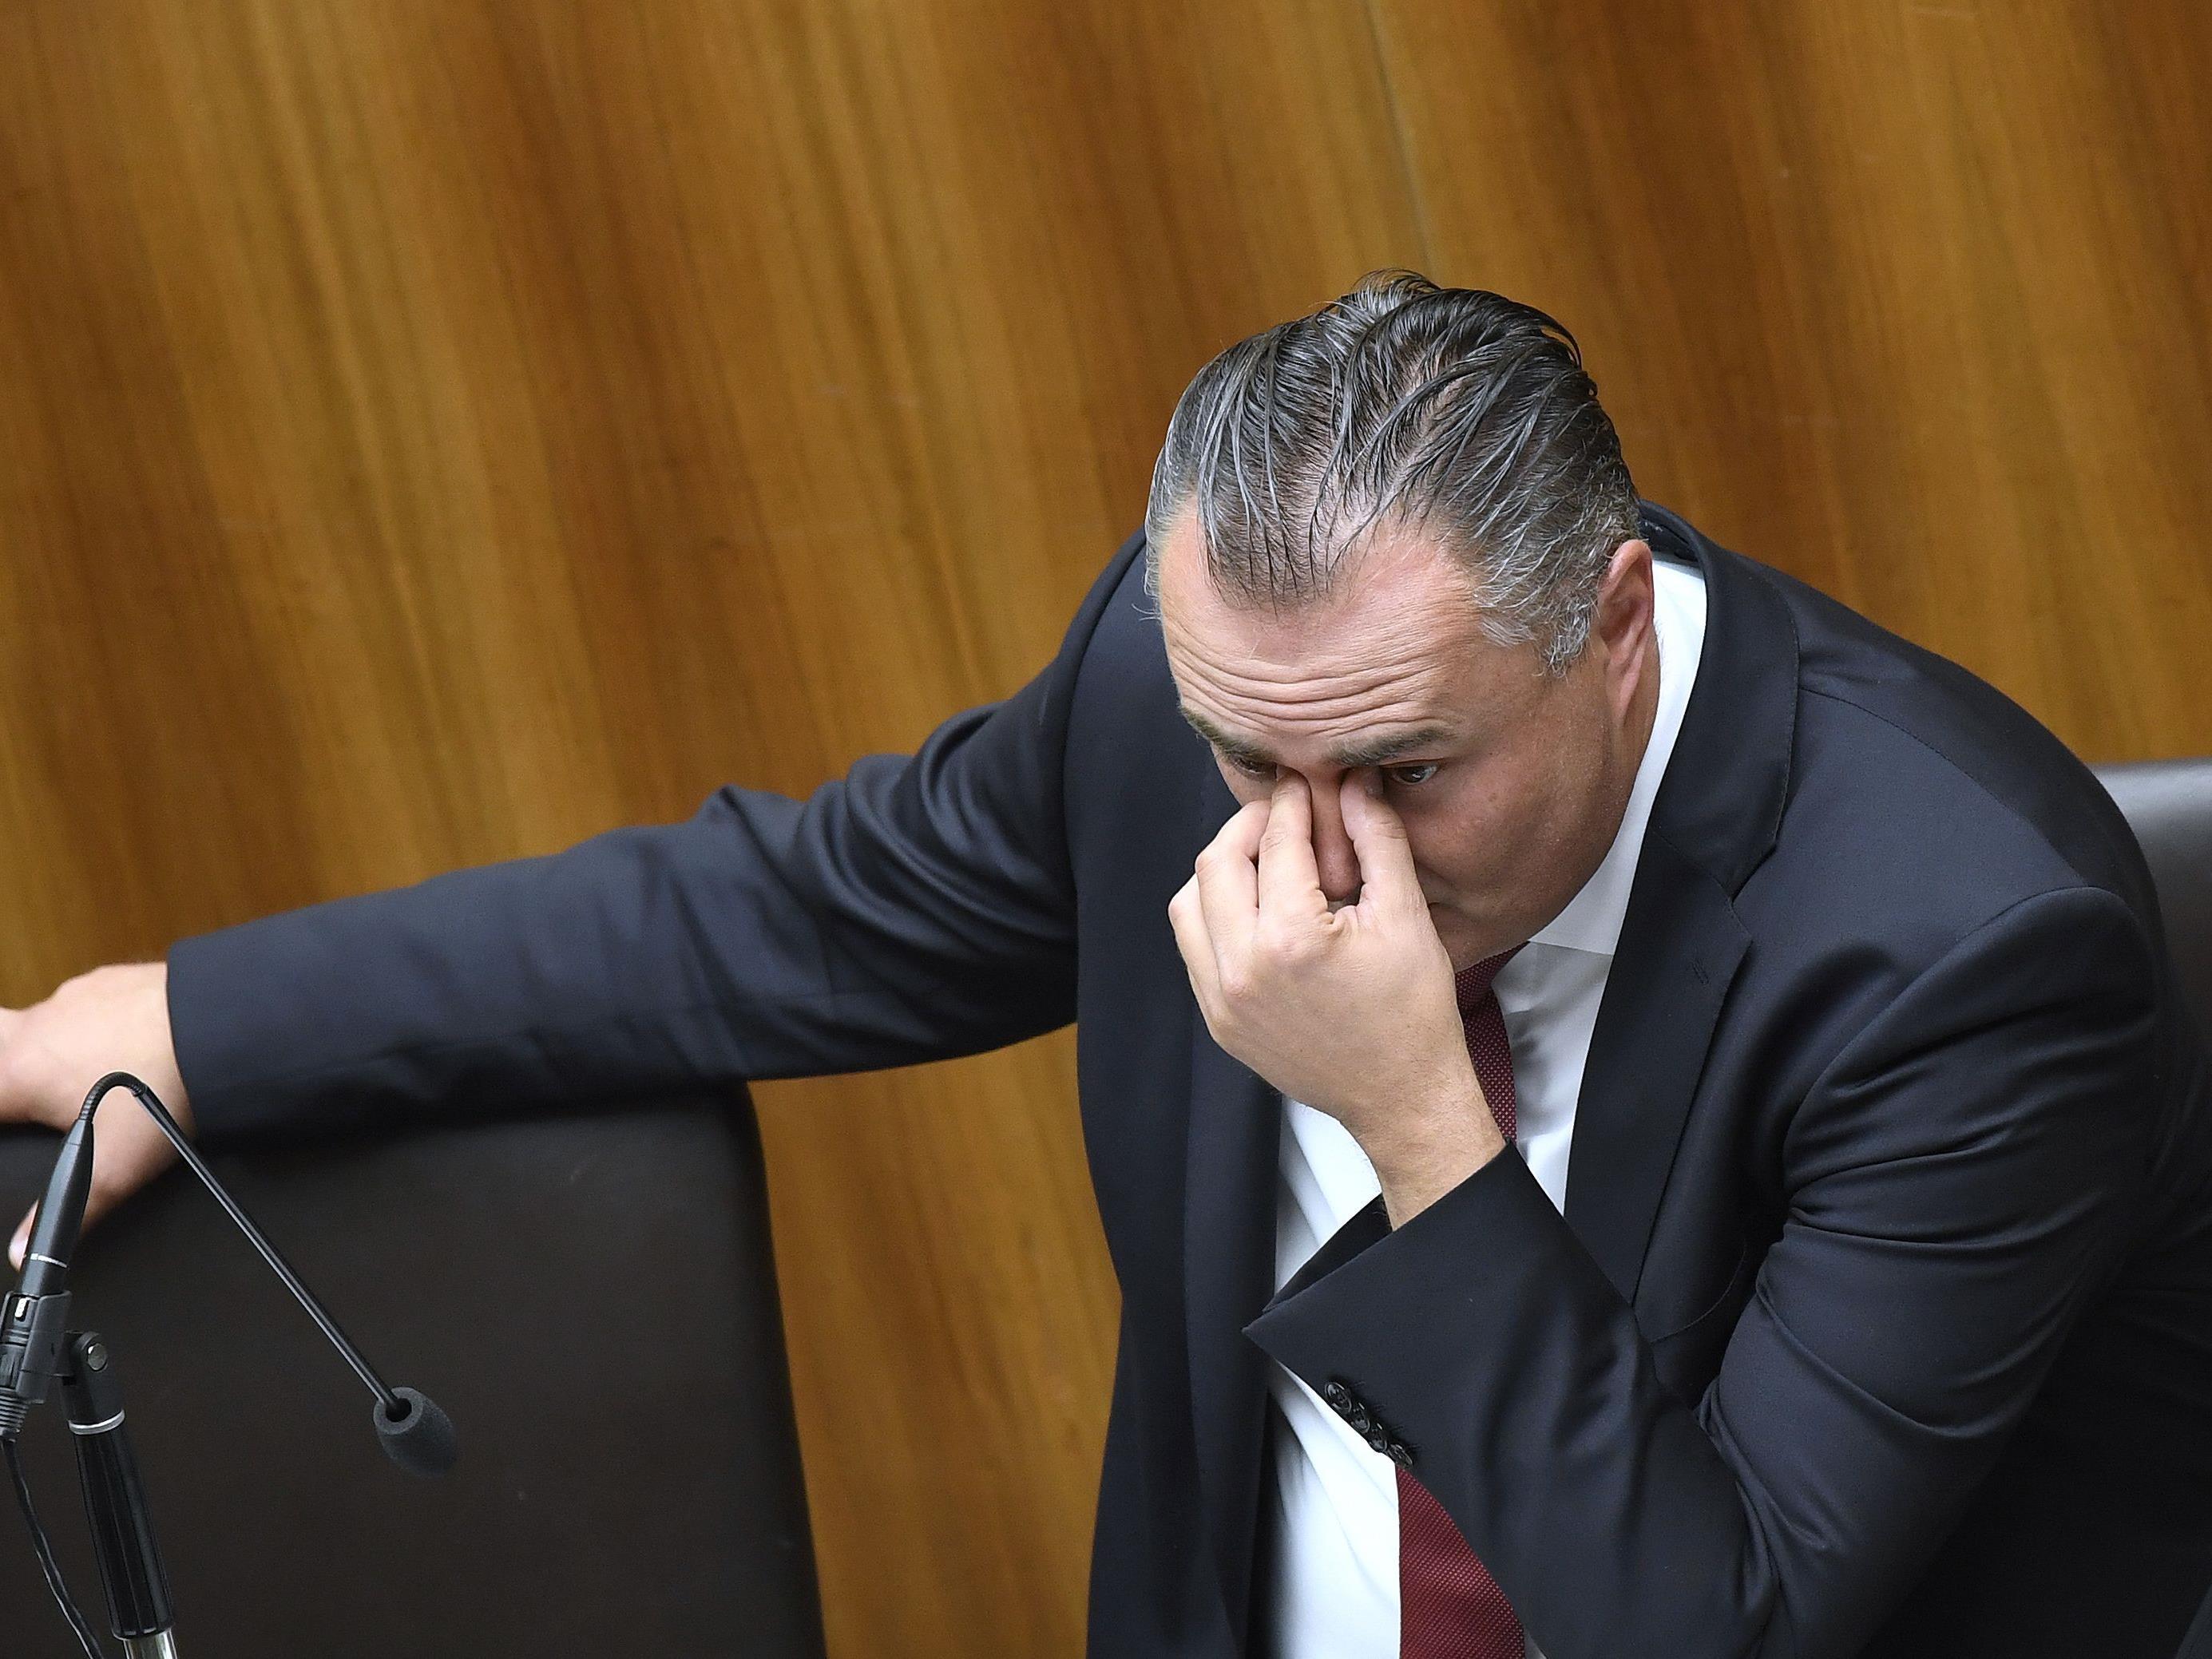 SPÖ-Verteidigungsminister Doskozil zur Causa Hübner